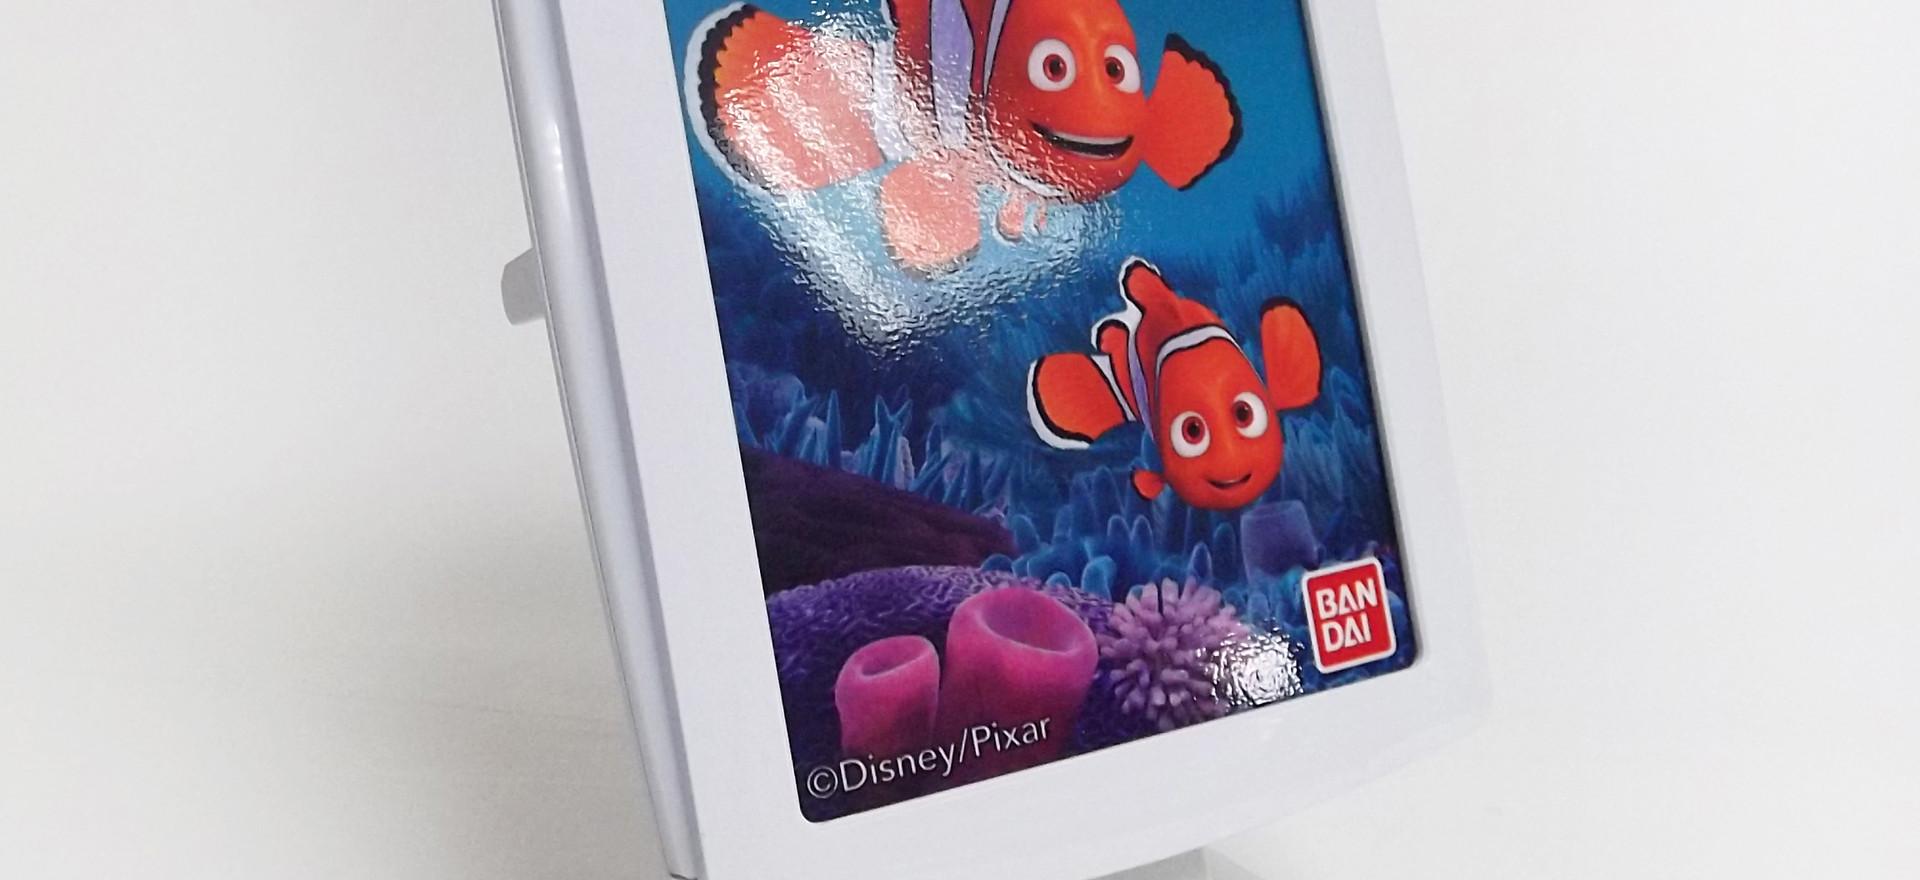 POP Acrylic Tabletop Display - Bandai Finding Nemo Disney